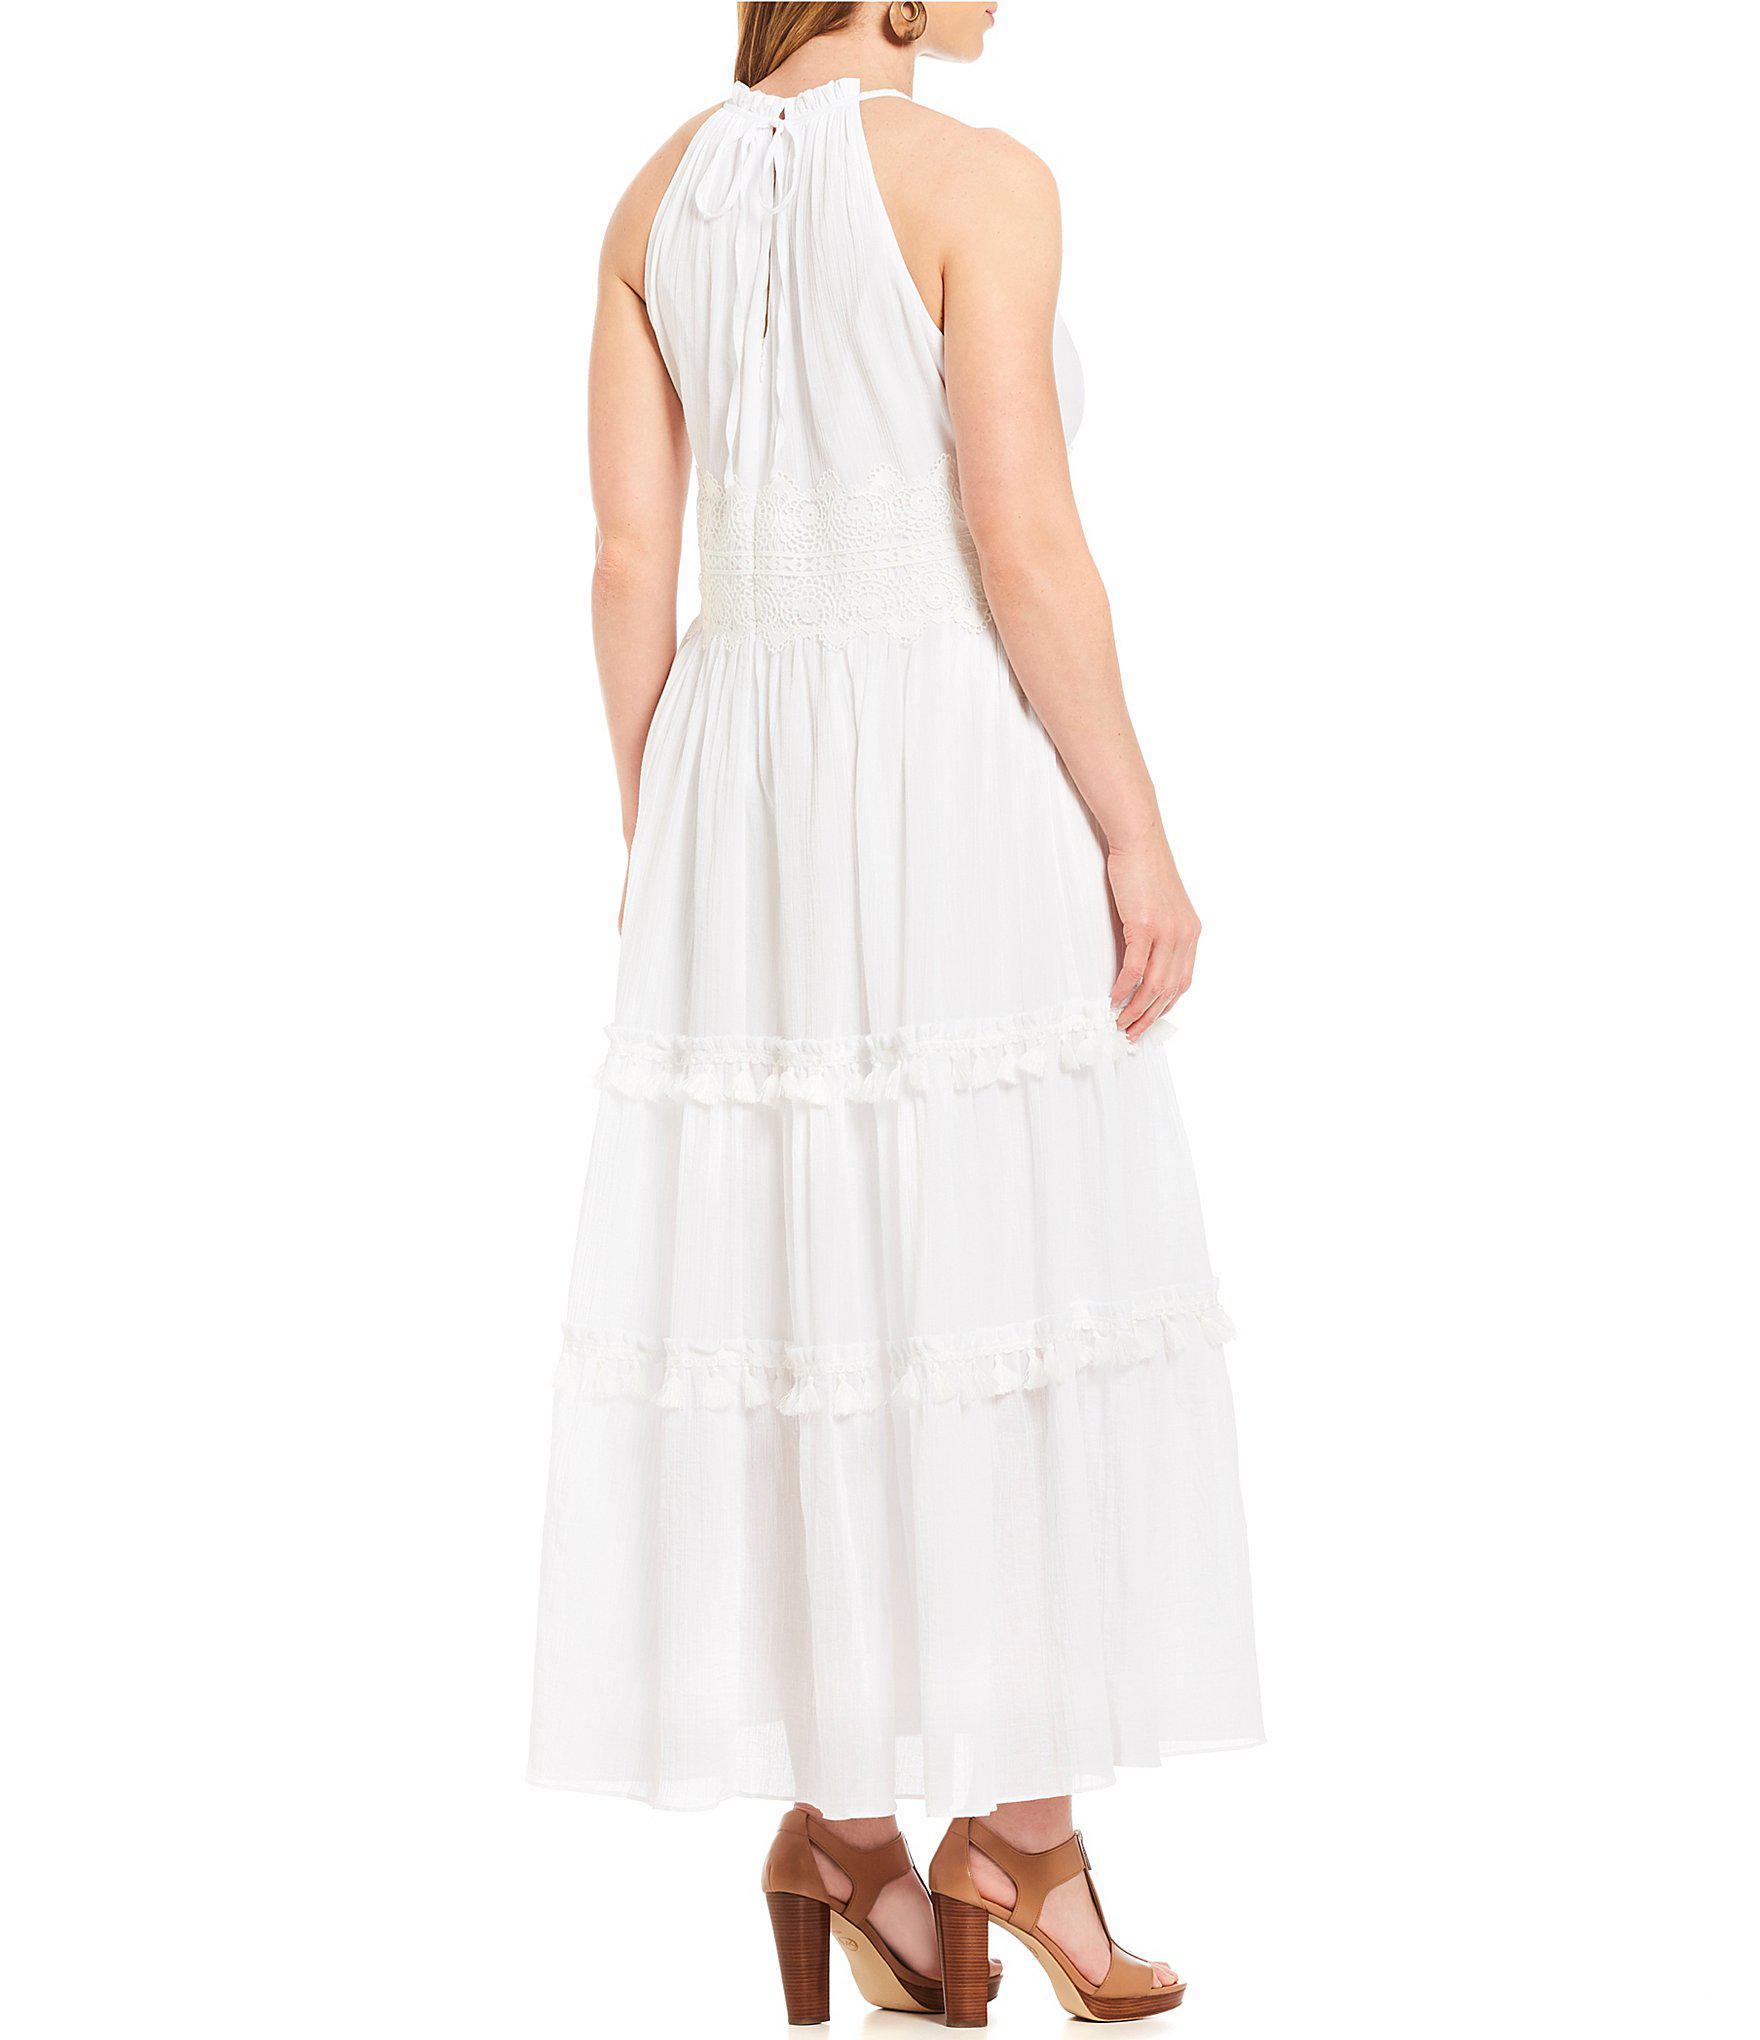 Eliza J Plus Size Lace Waist Halter Maxi Dress in White - Lyst